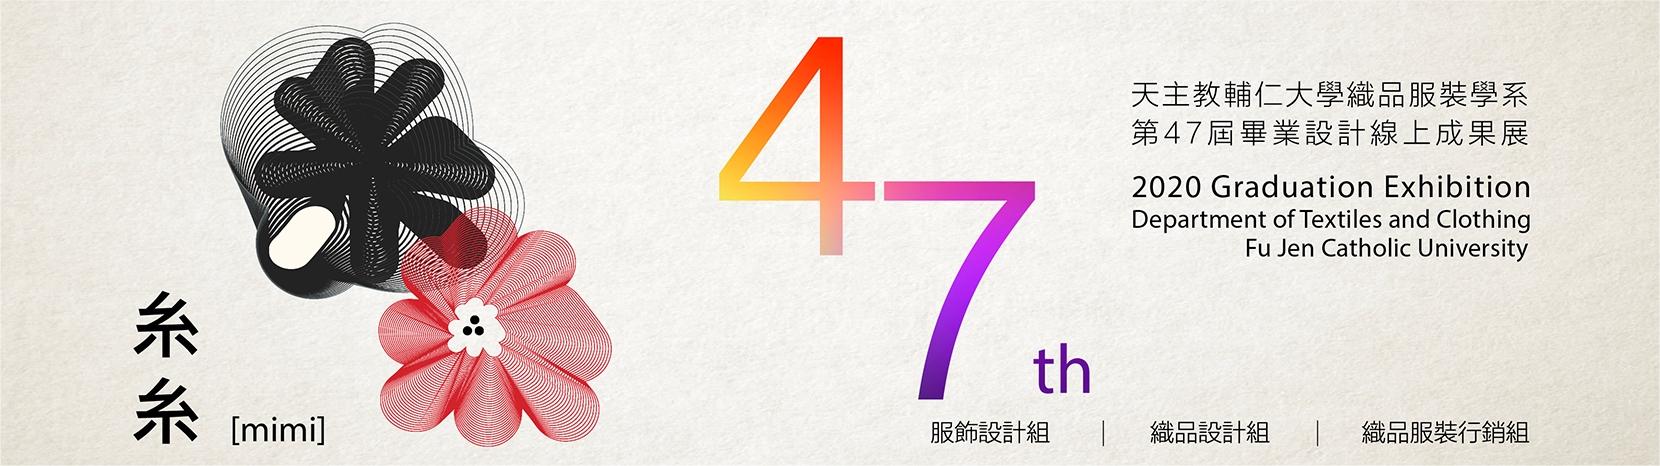 47th畢業設計線上成果展《糸糸》